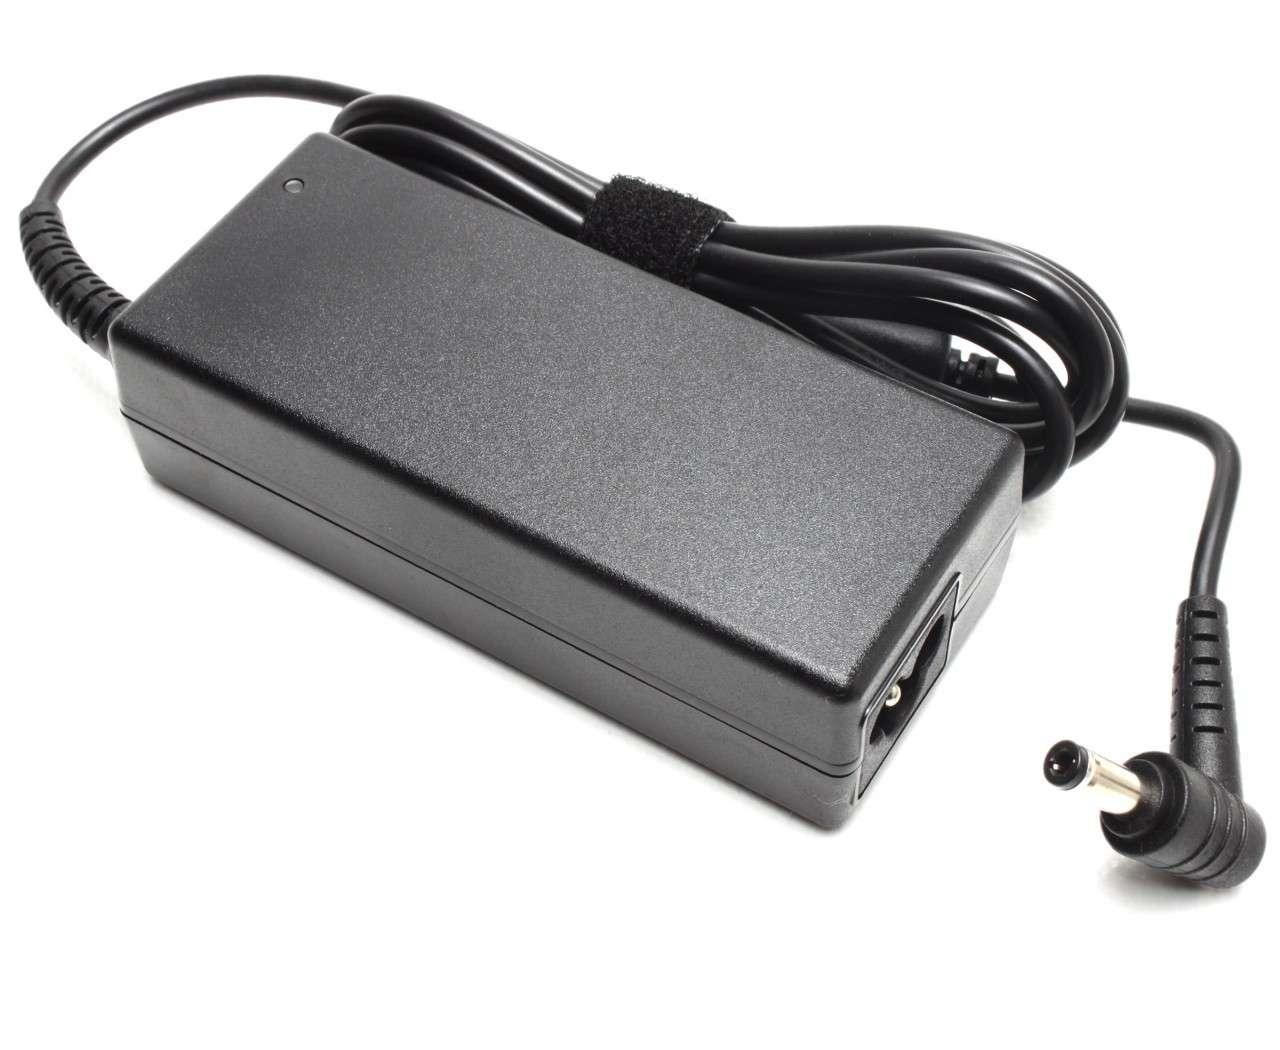 Incarcator Advent 9915W imagine powerlaptop.ro 2021